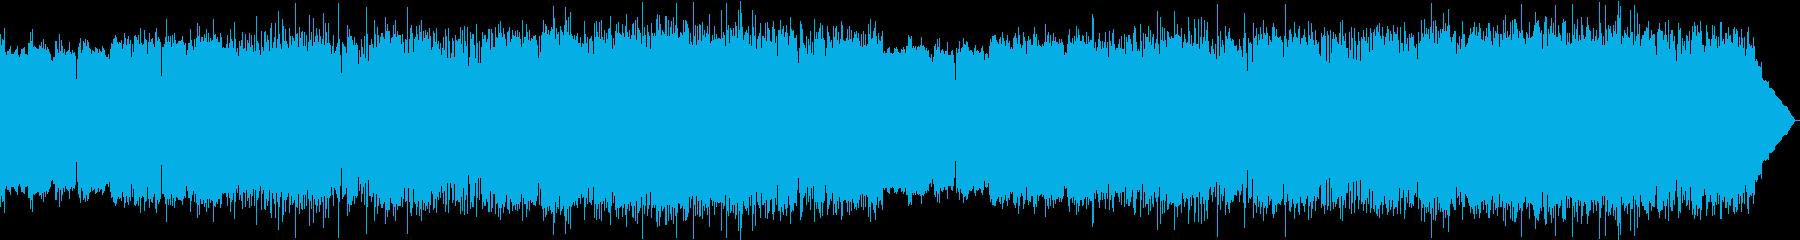 【8bit】シリアスな洞窟ダンジョンの再生済みの波形